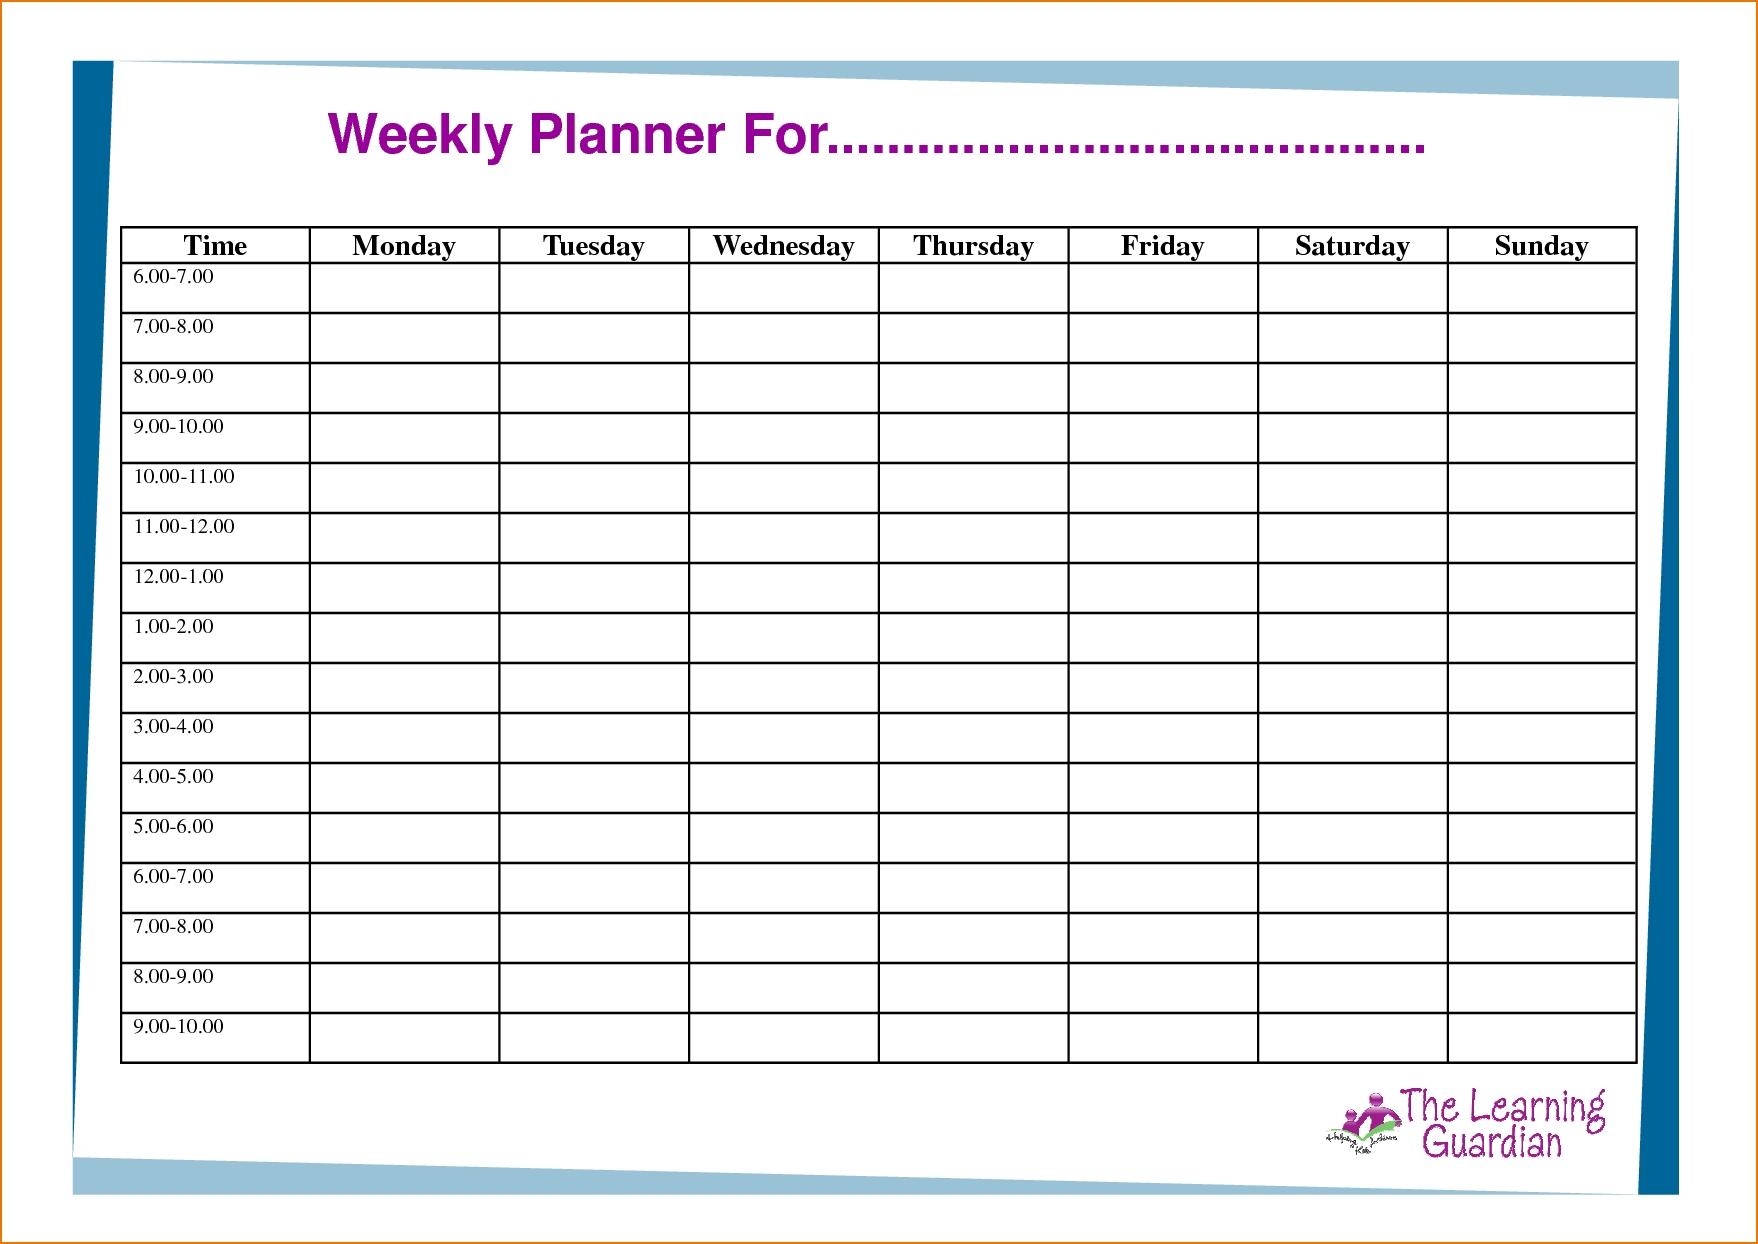 Weekly Task List Template Samples To Inspire You | Koolioo